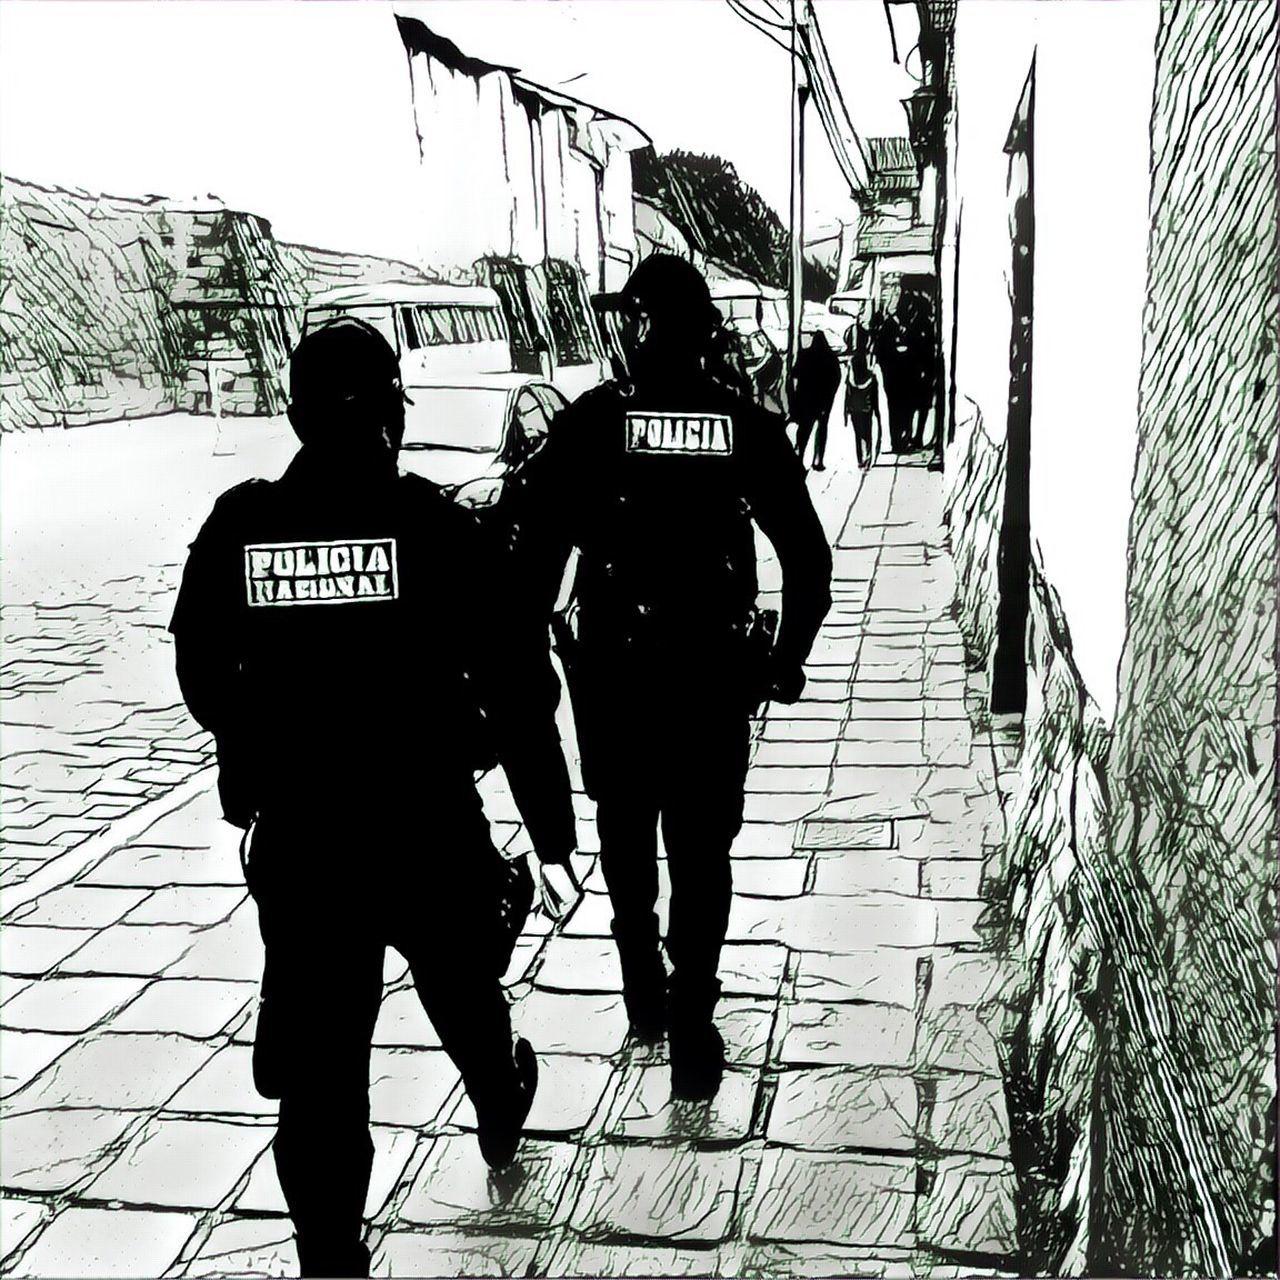 Police Police Force Two People Text Occupation Outdoors Peru Cusco, Peru Patrolling Art Comic Drawn ArtWork Black & White Artistic B&w